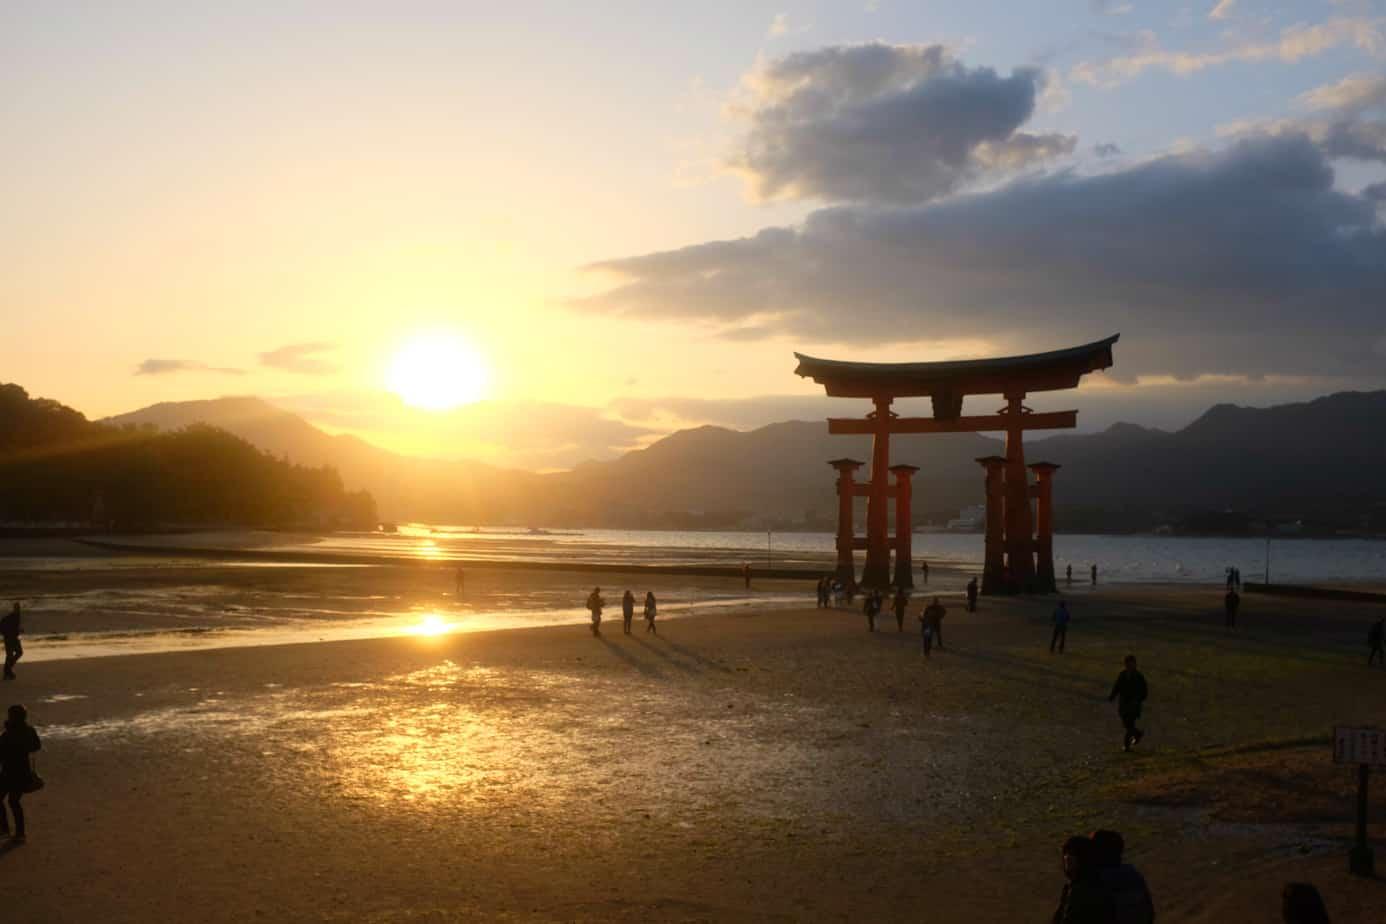 Itsukushima Island in Japan